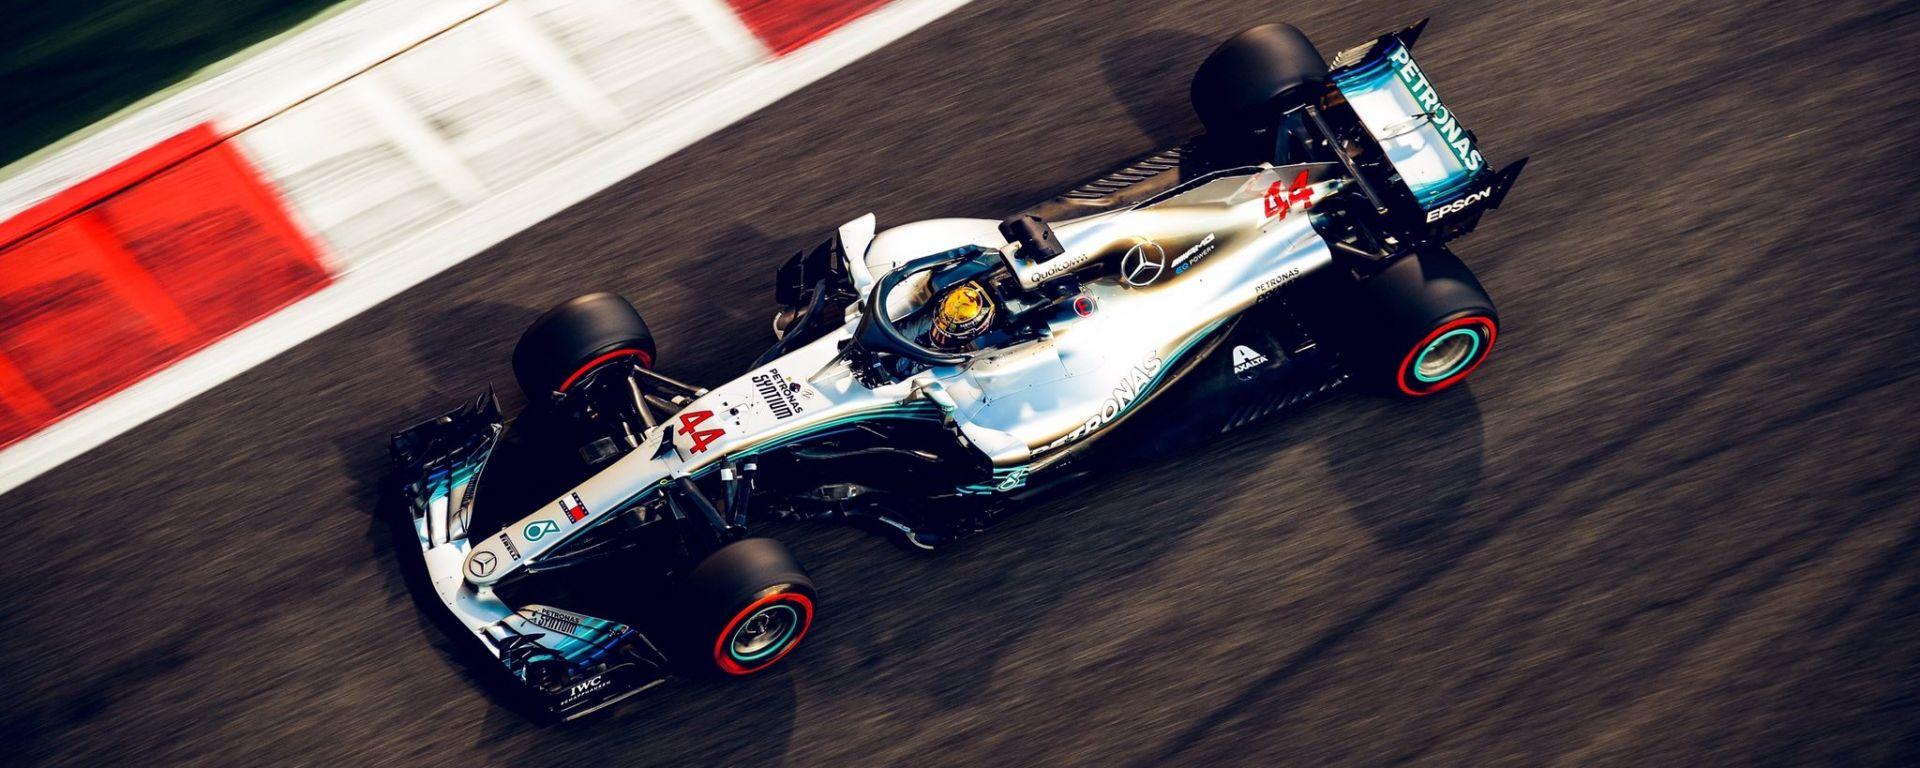 Gp Abu Dhabi 2018, Lewis Hamilton (Mercedes)